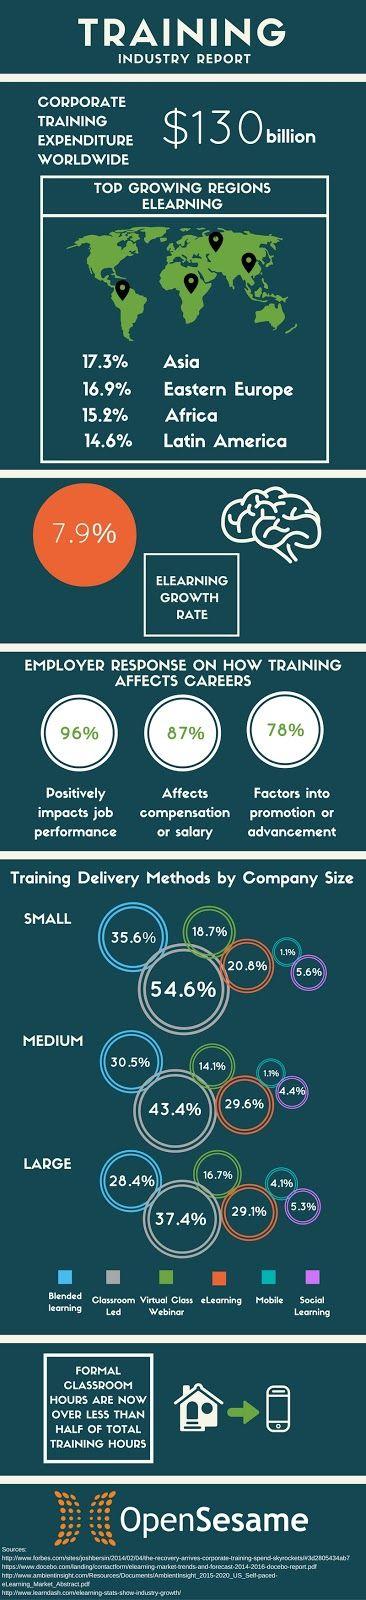 Corporate training market-5.jpg